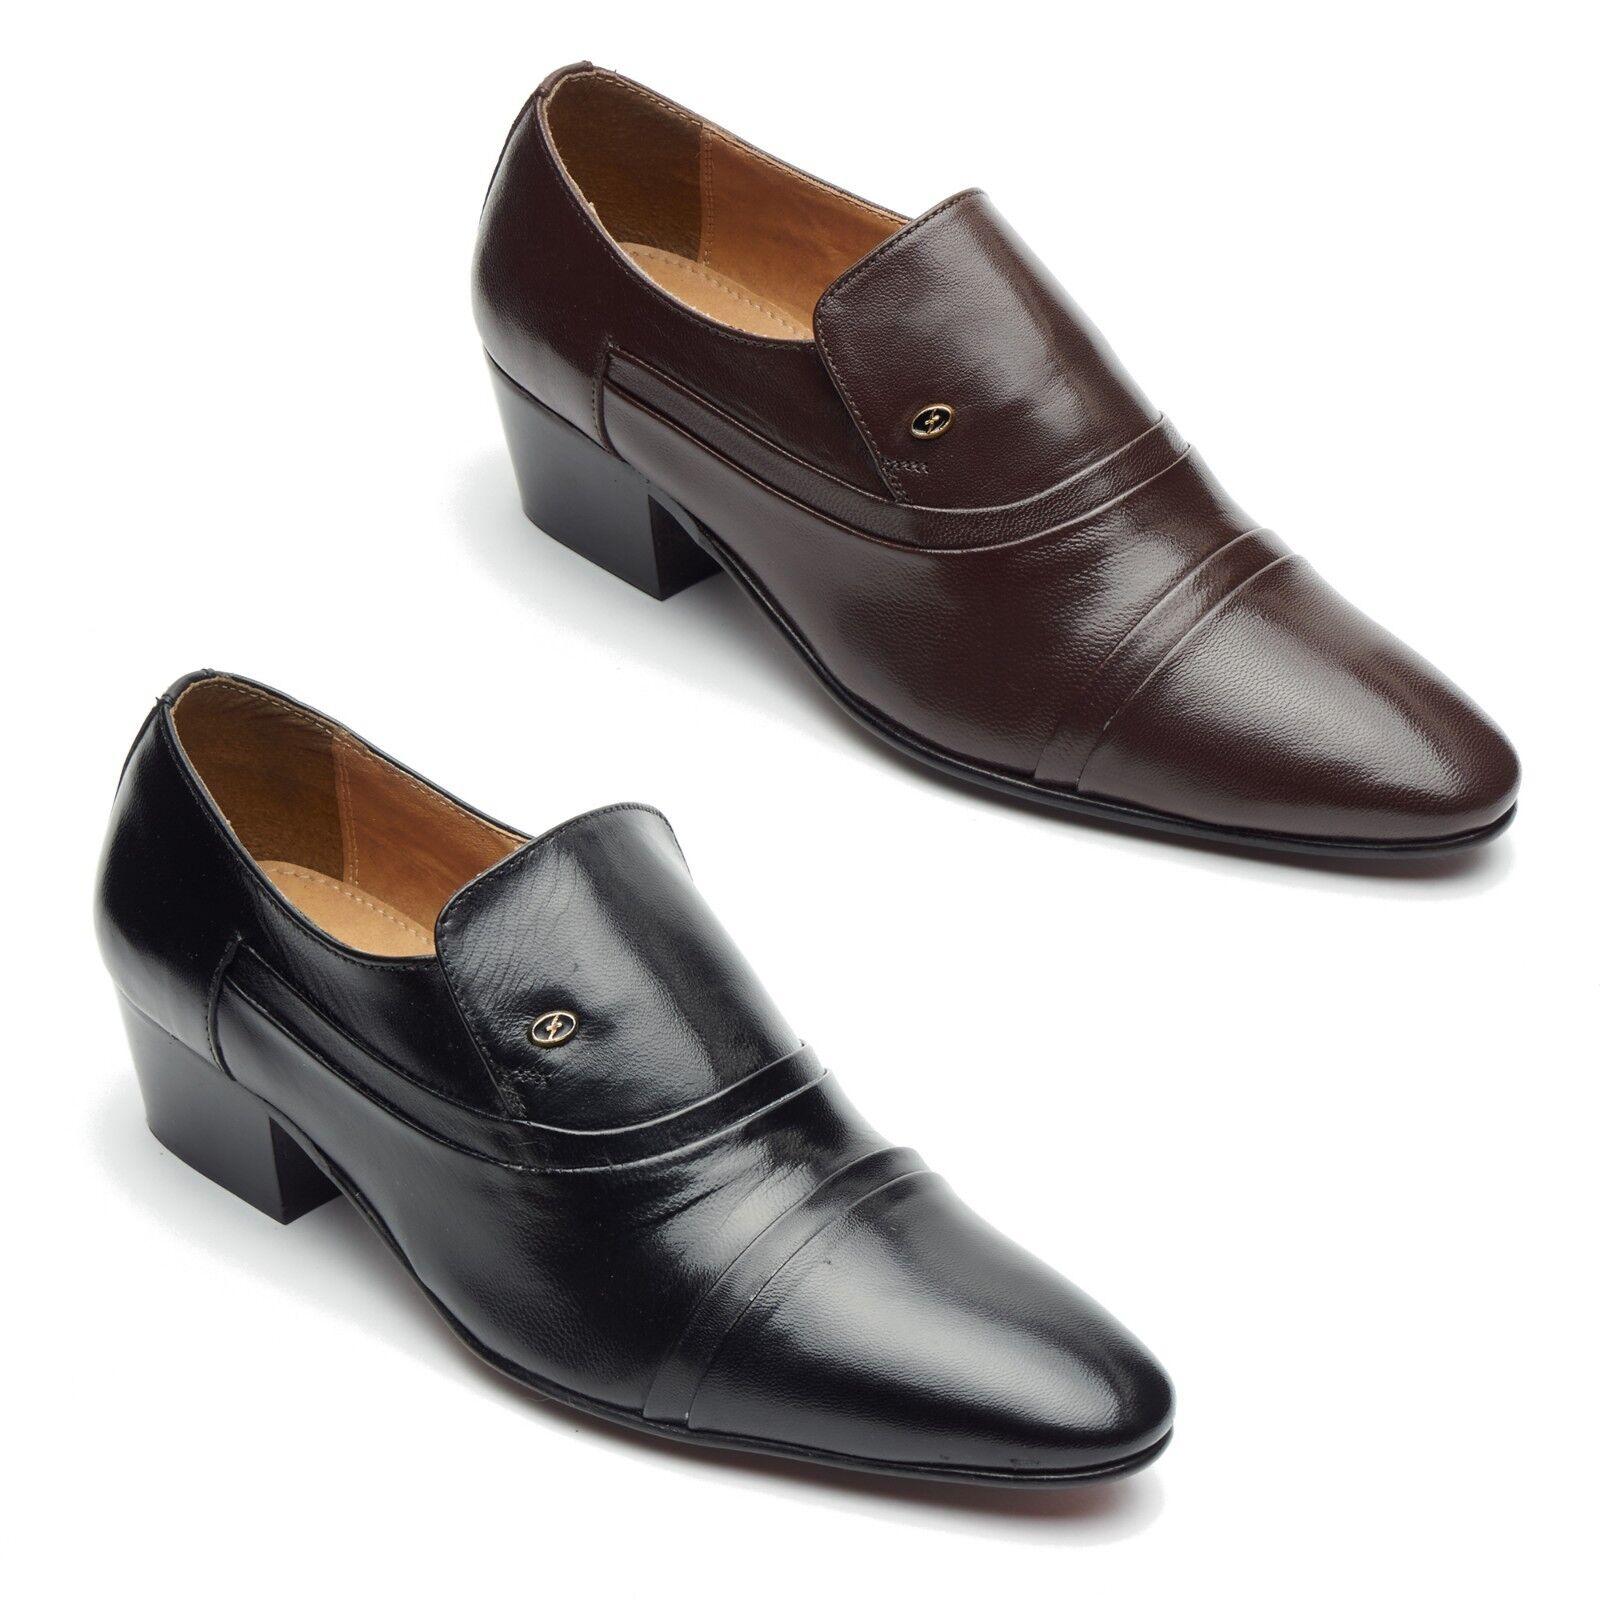 Mens Formal Leather Cuban Heel Pointed Formal Mens Wedding Slip On Shoes 0b382b